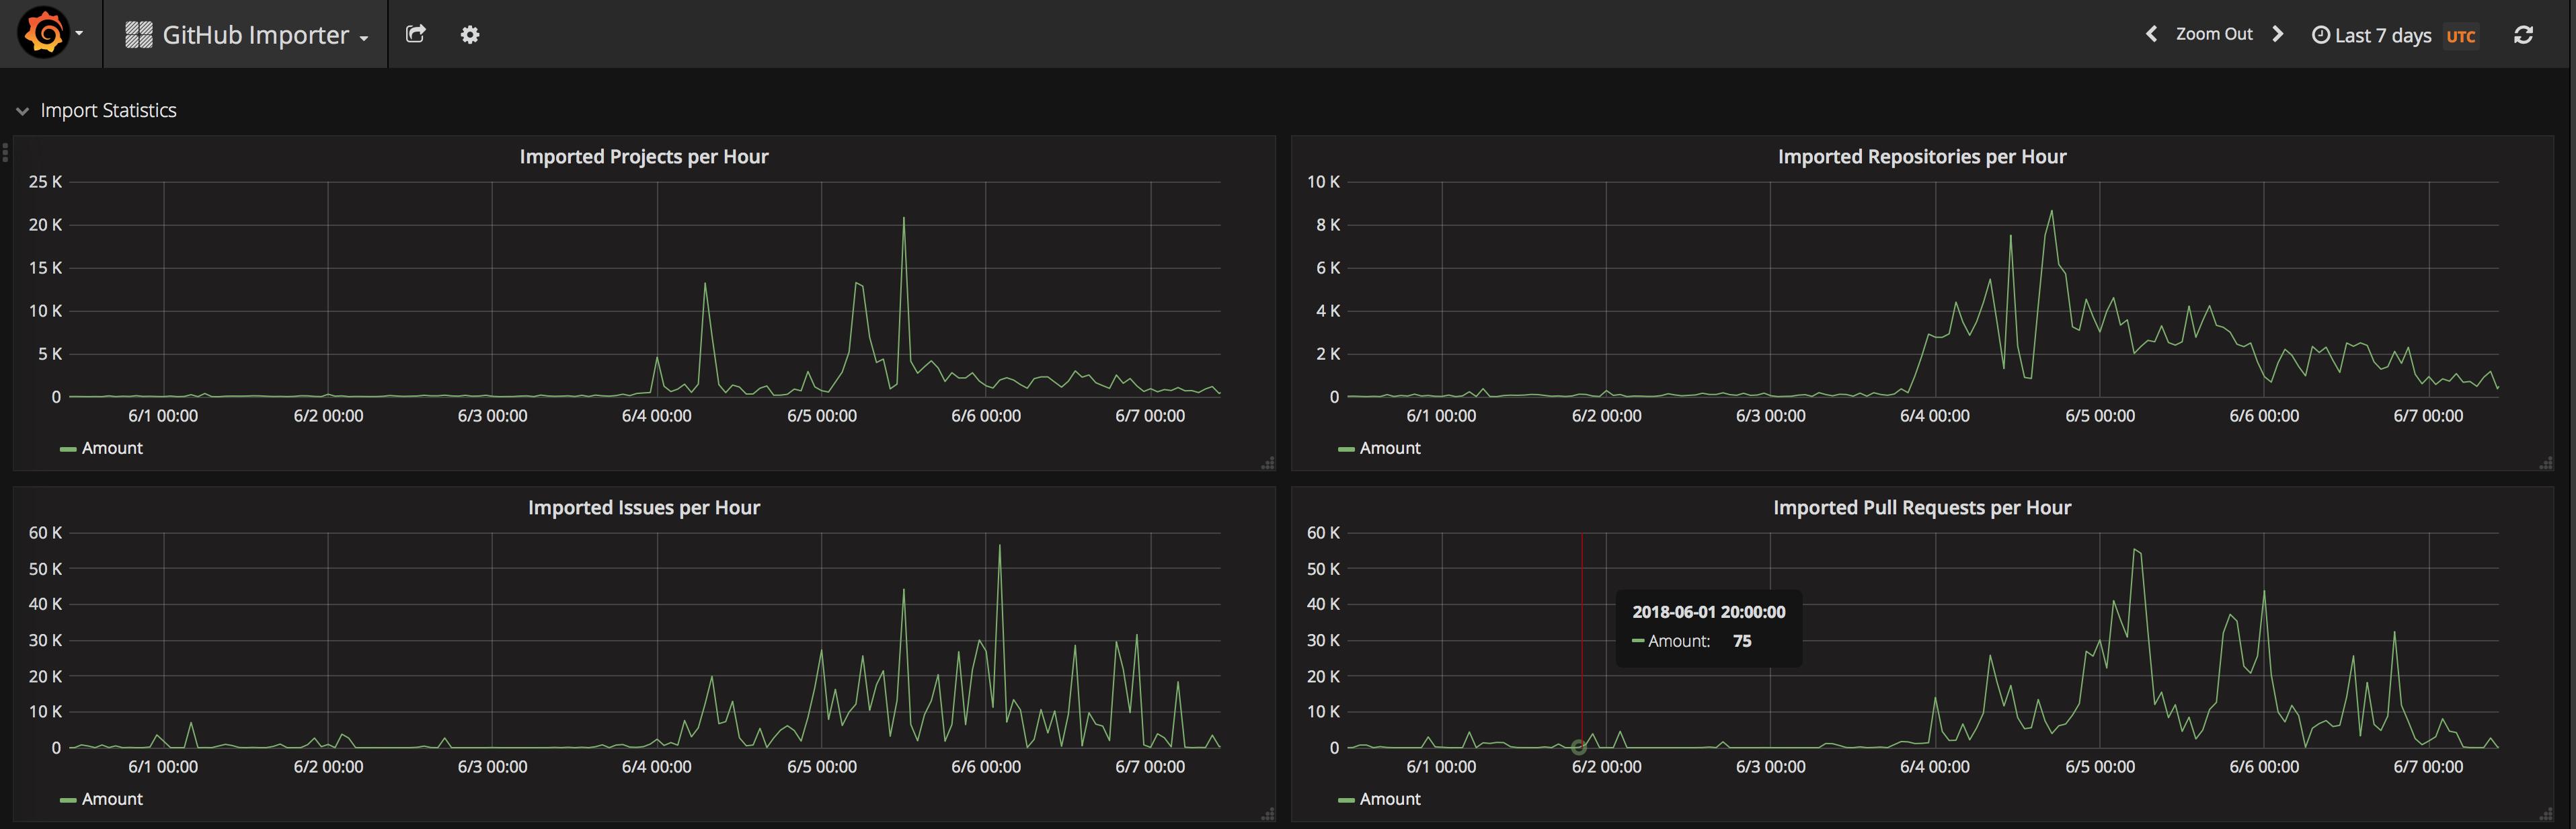 GitLab importer statistics